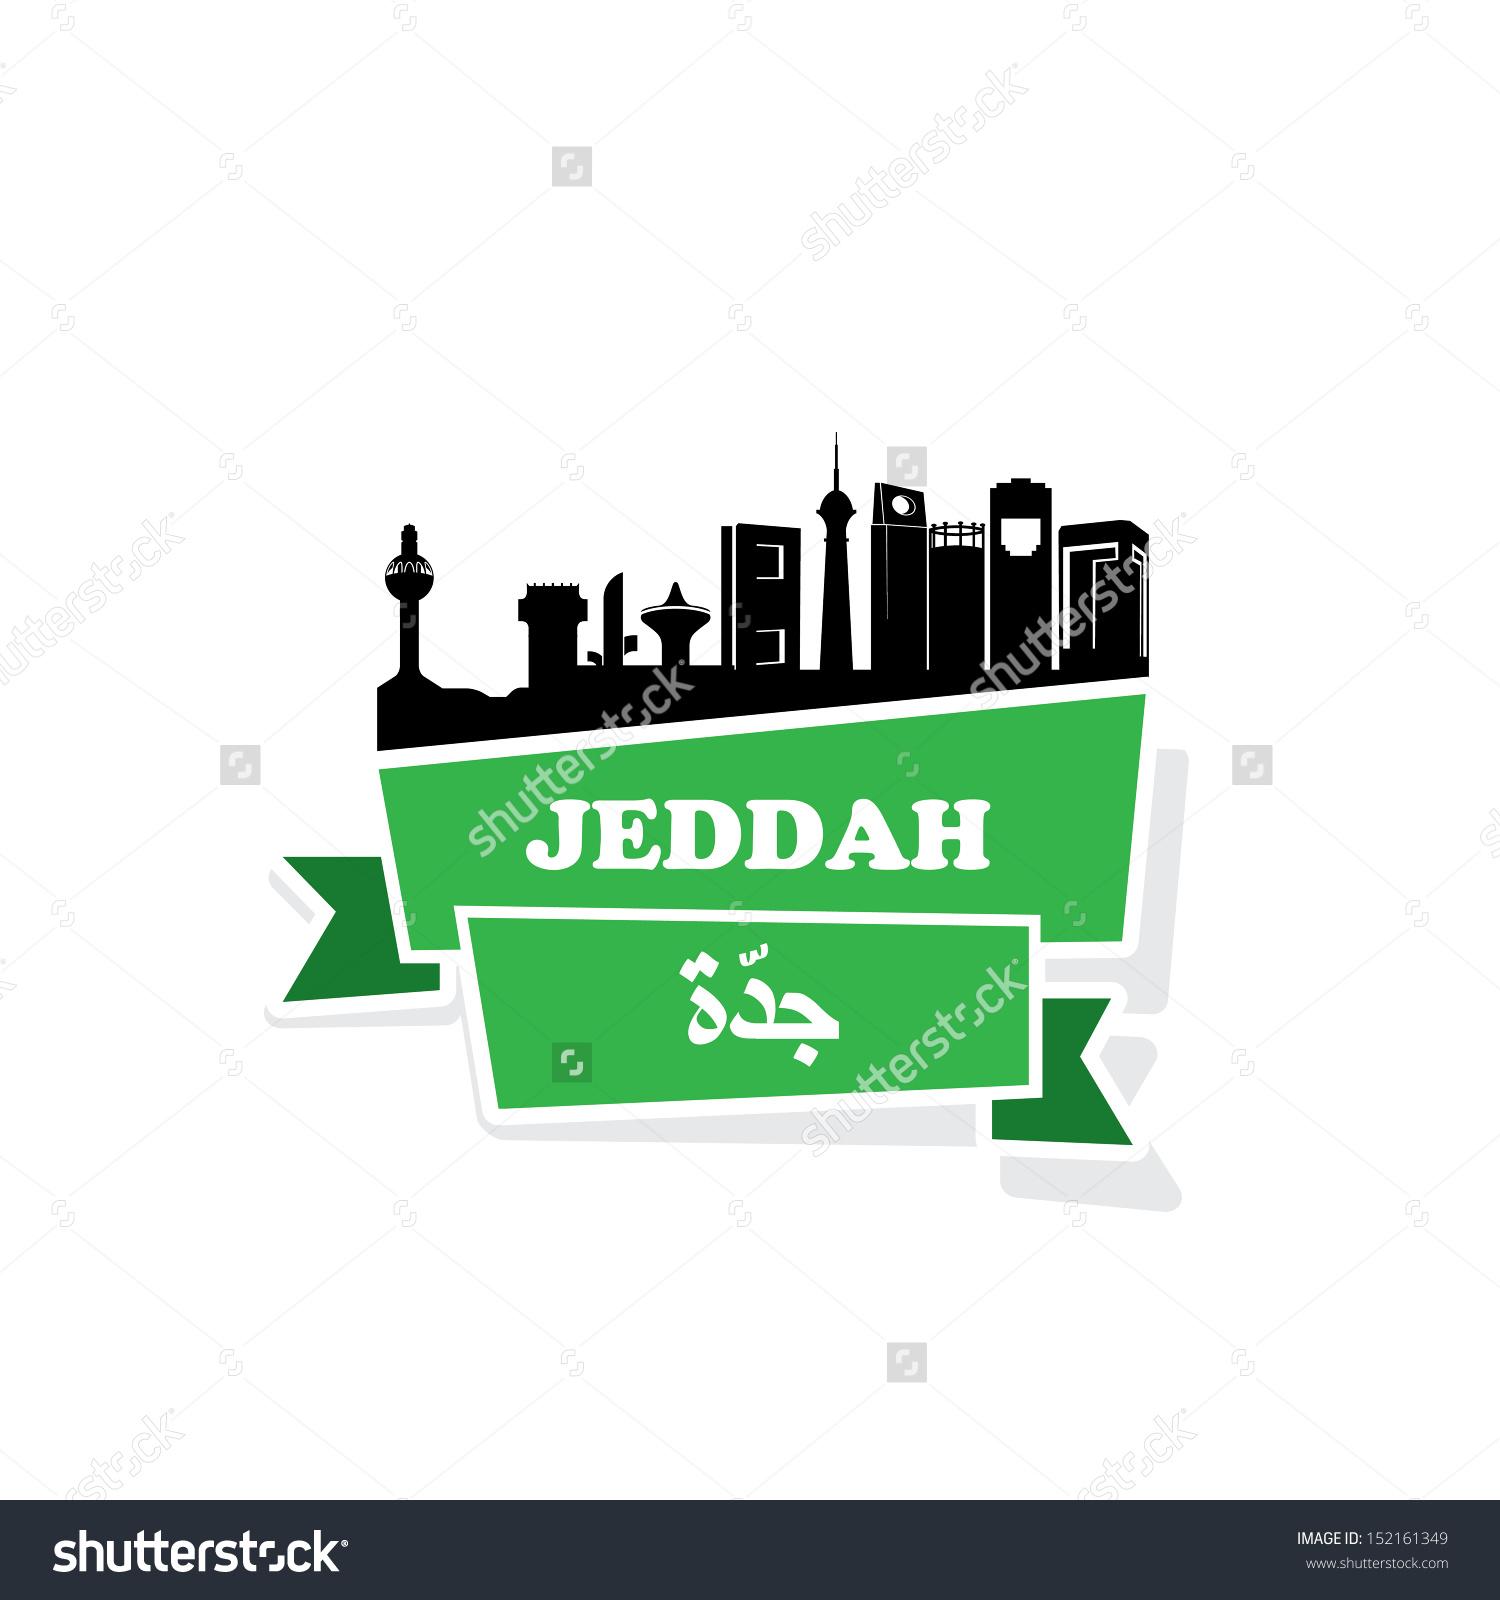 Jeddah City Ribbon Banner Vector Illustration Stock Vector.